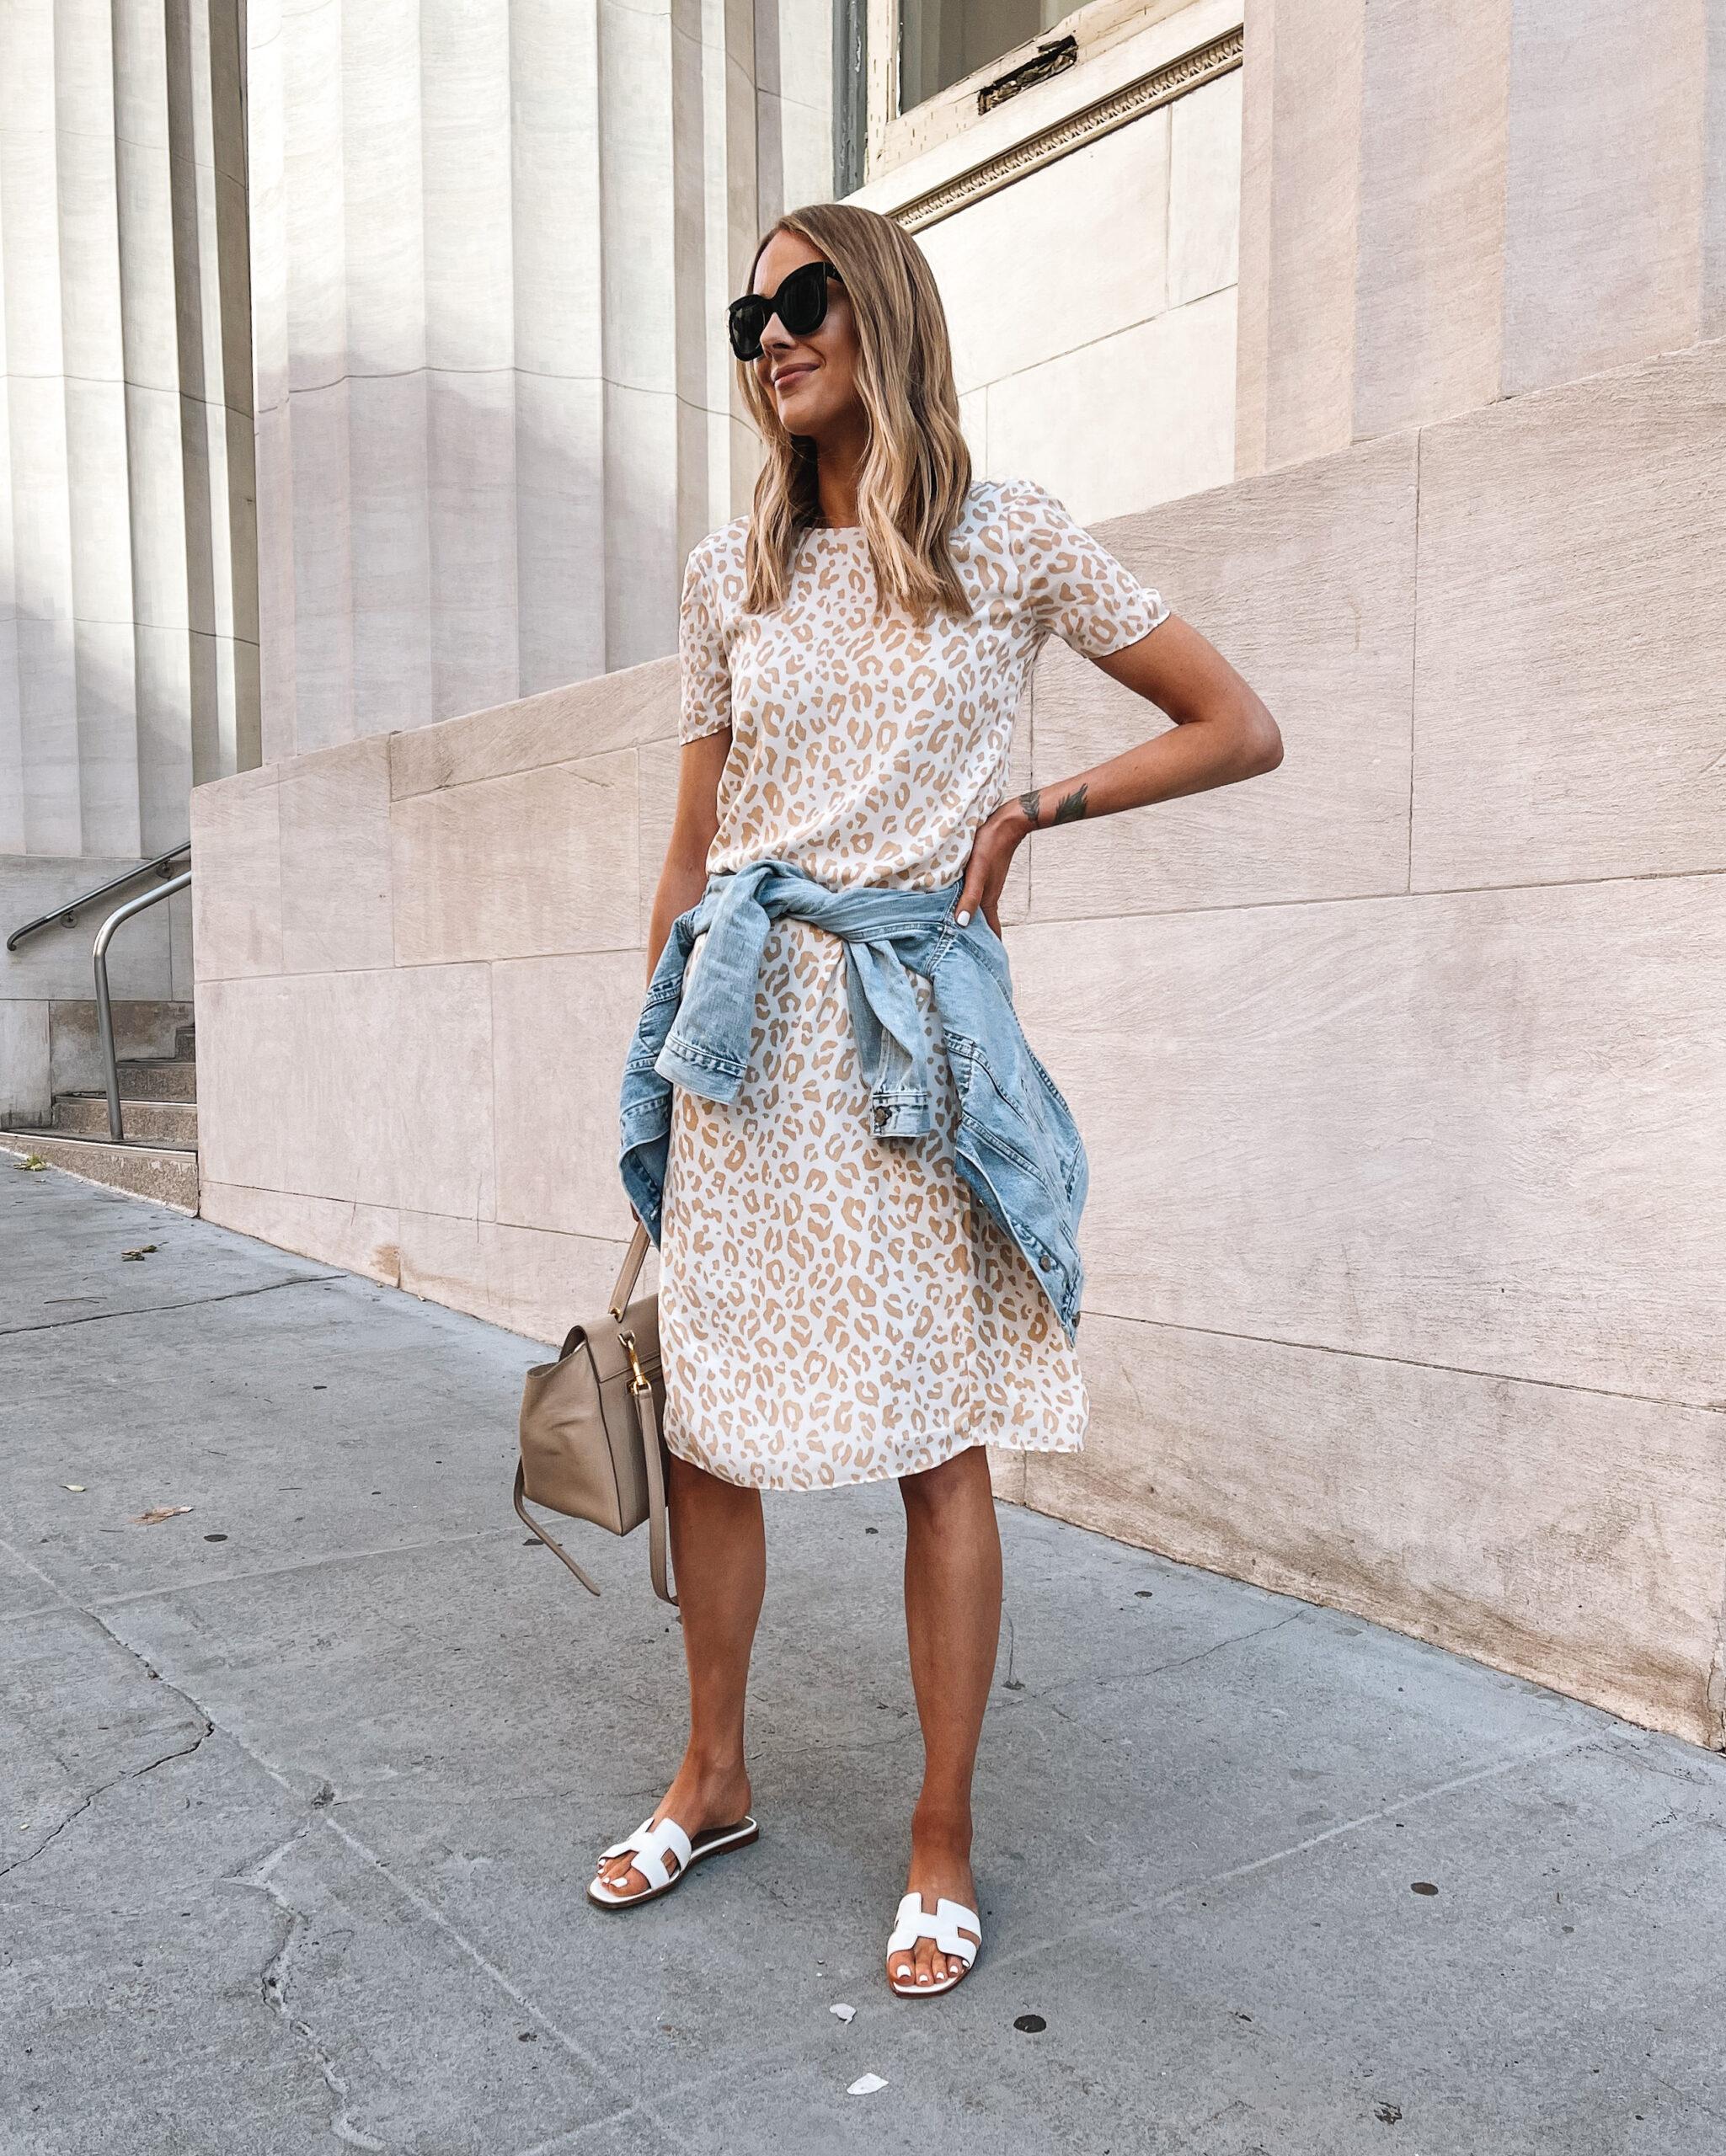 Fashion Jackson Wearing Jenni Kayne Leopard Midi Dress Denim Jacket White Hermes Oran Sandals Summer Dress Outfit